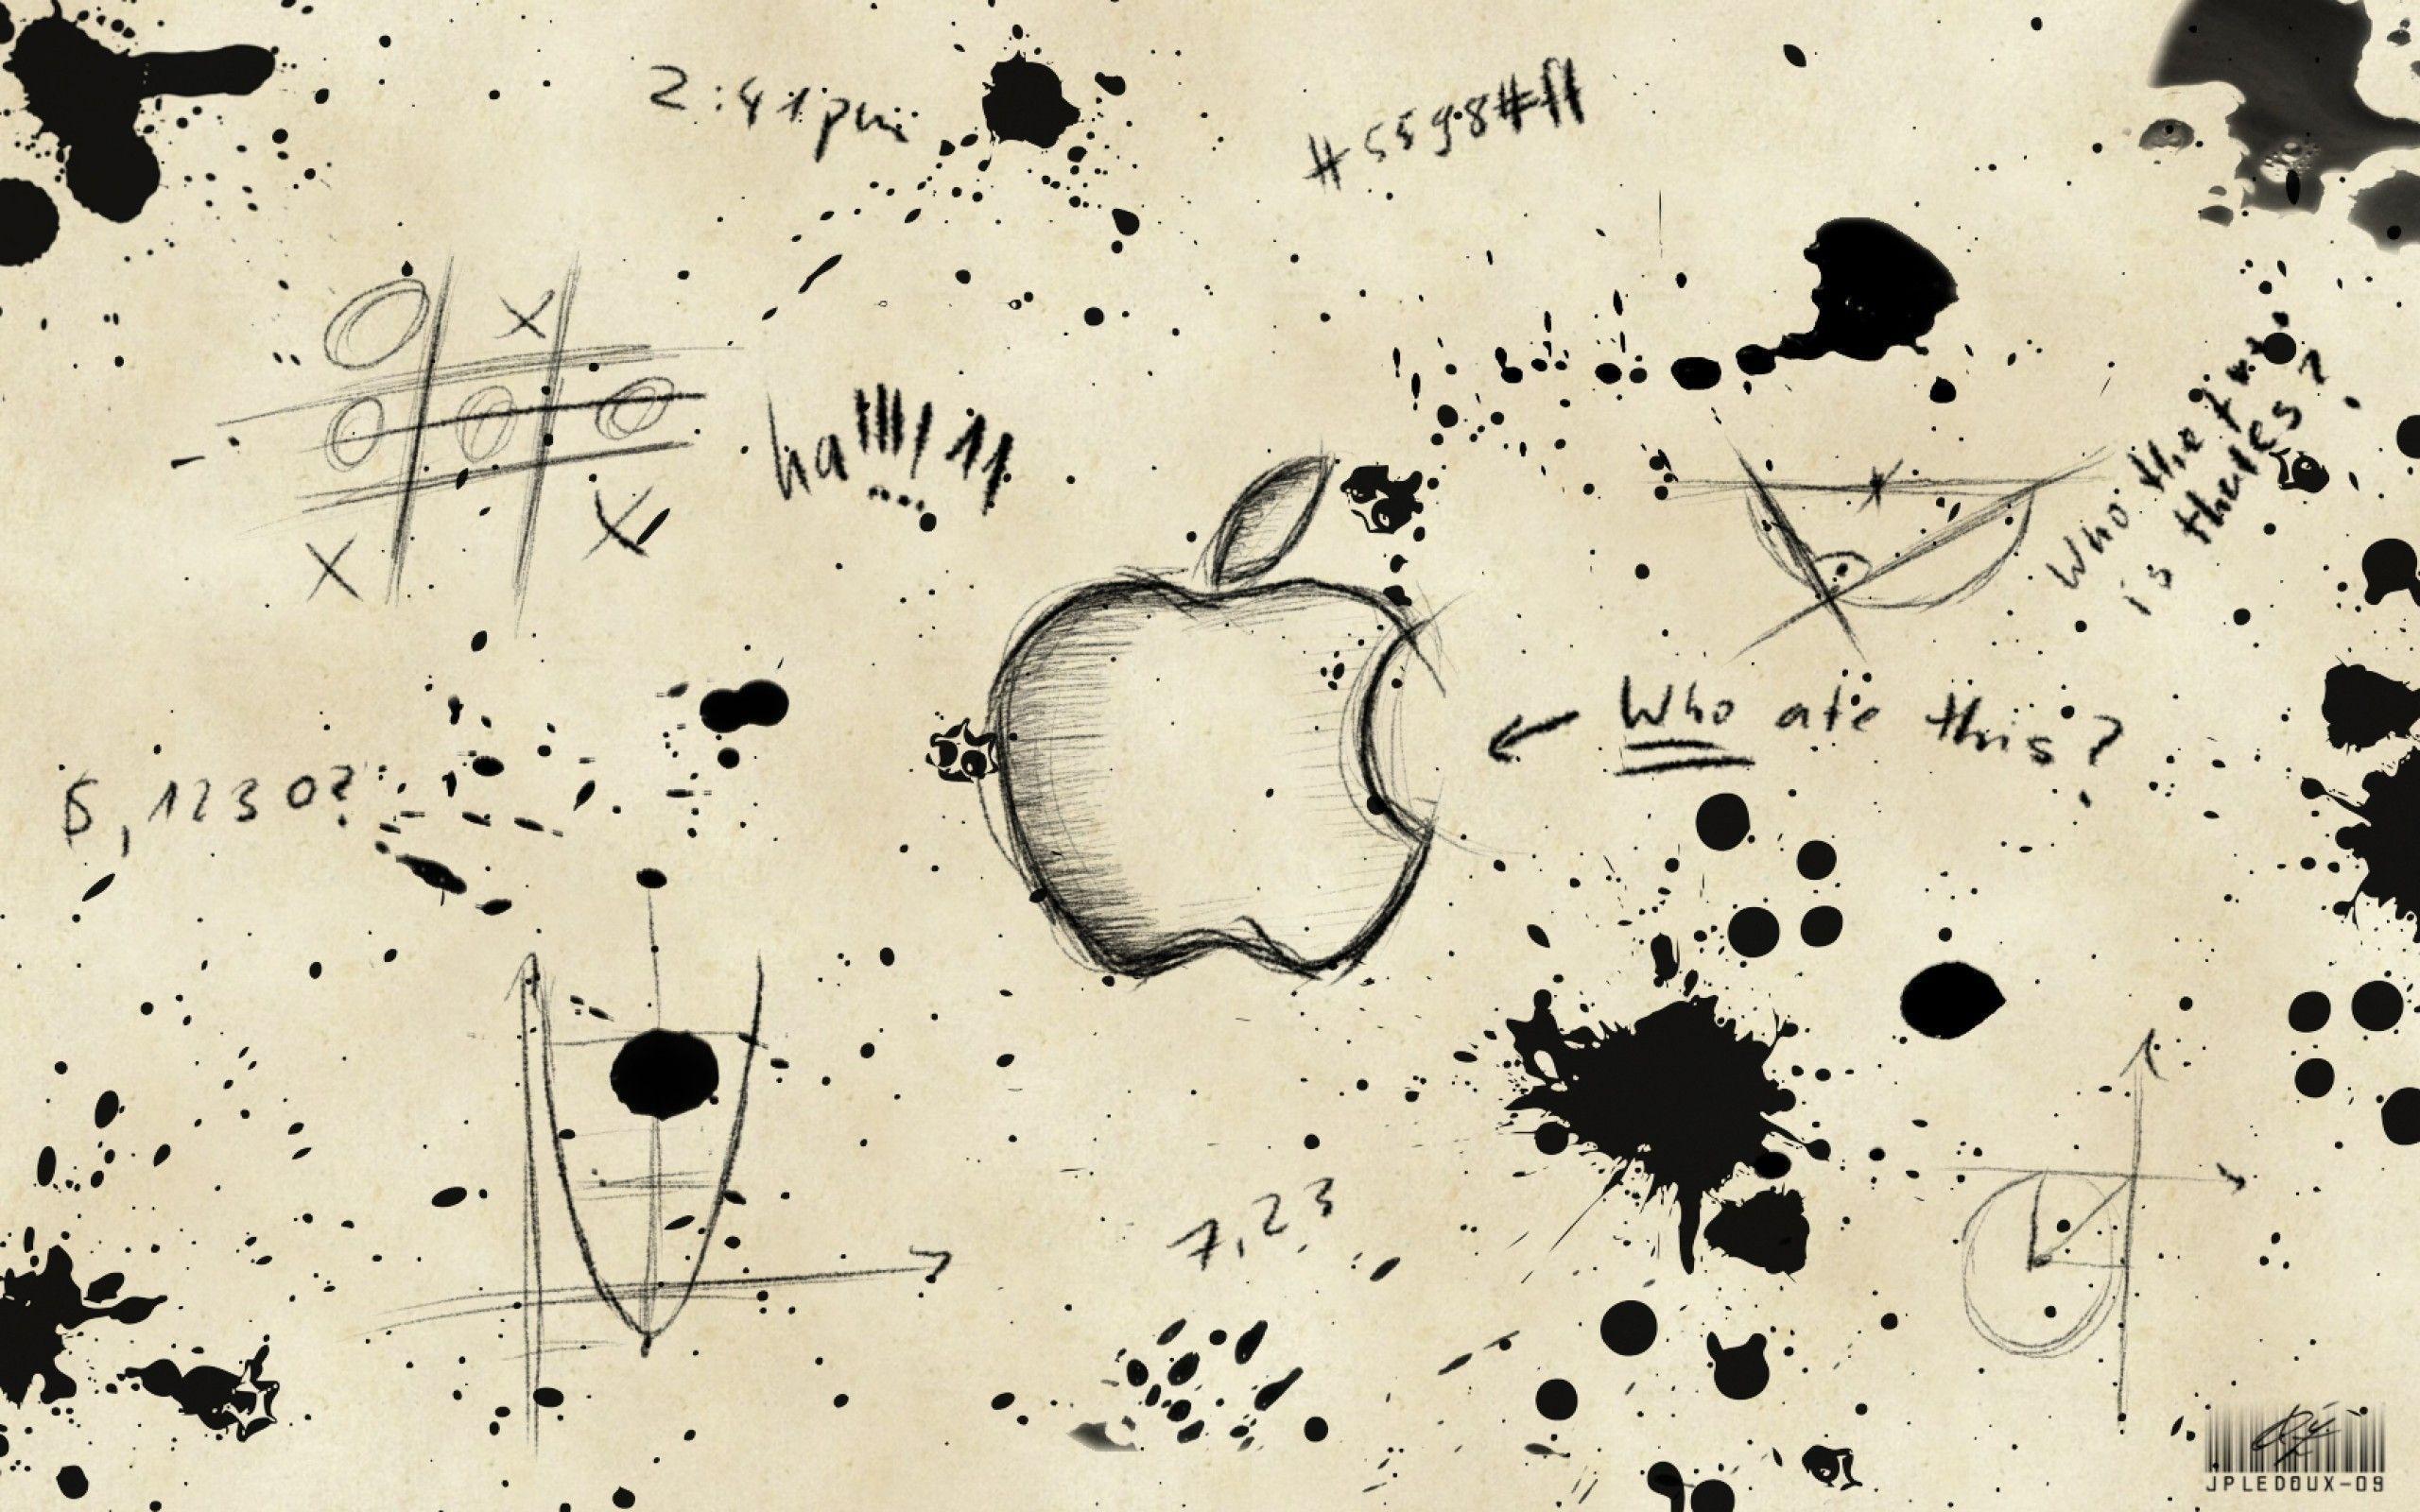 download Sketch Wallpapers [2560x1600] for your Desktop 2560x1600